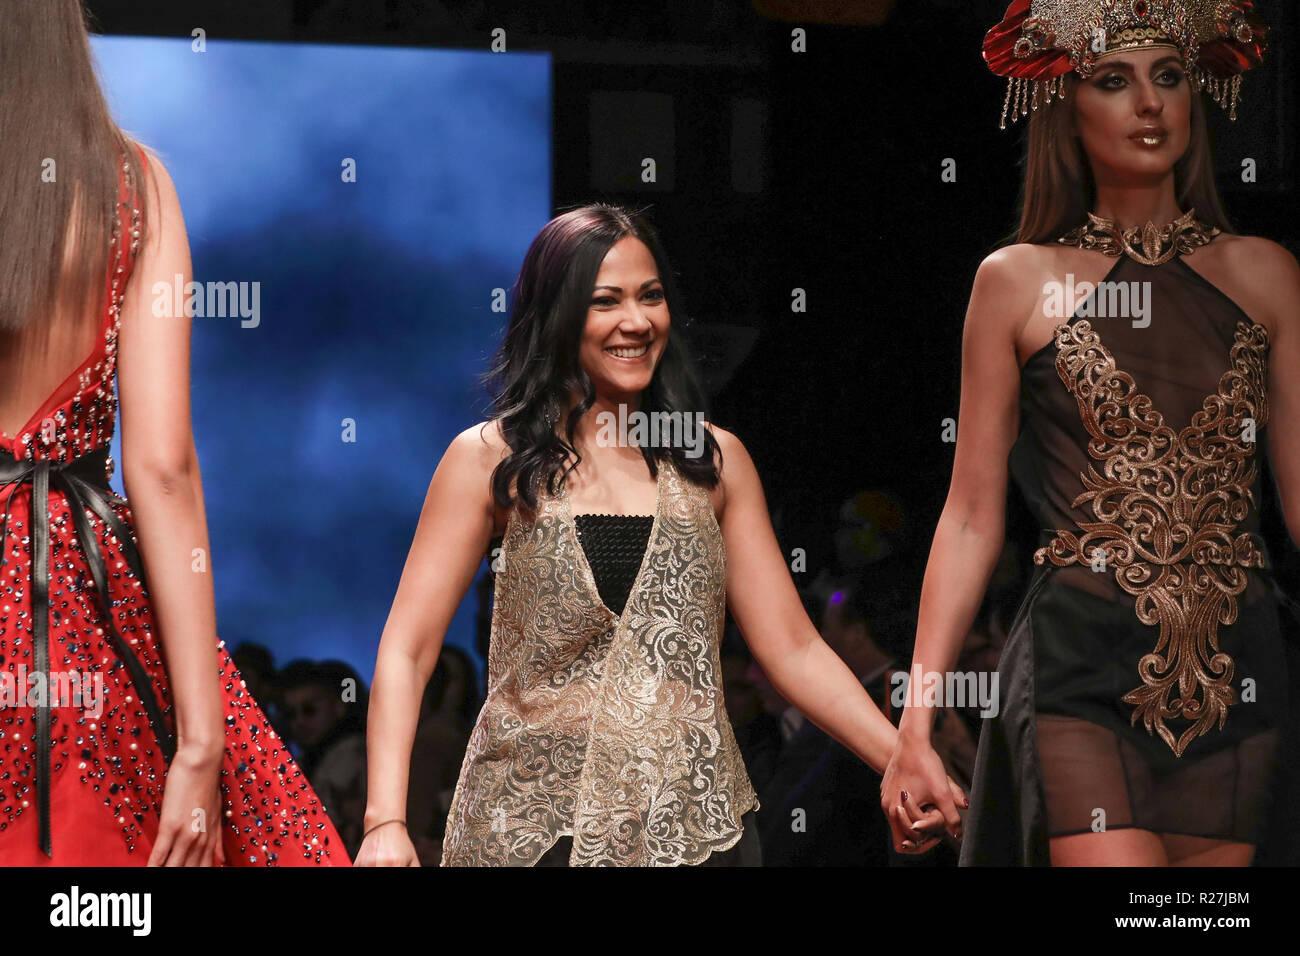 Los Angeles Fashion Week Art Hearts Fashion Kahini Couture Catwalk Featuring Joy Sircar Mcmillen Fashion Designer